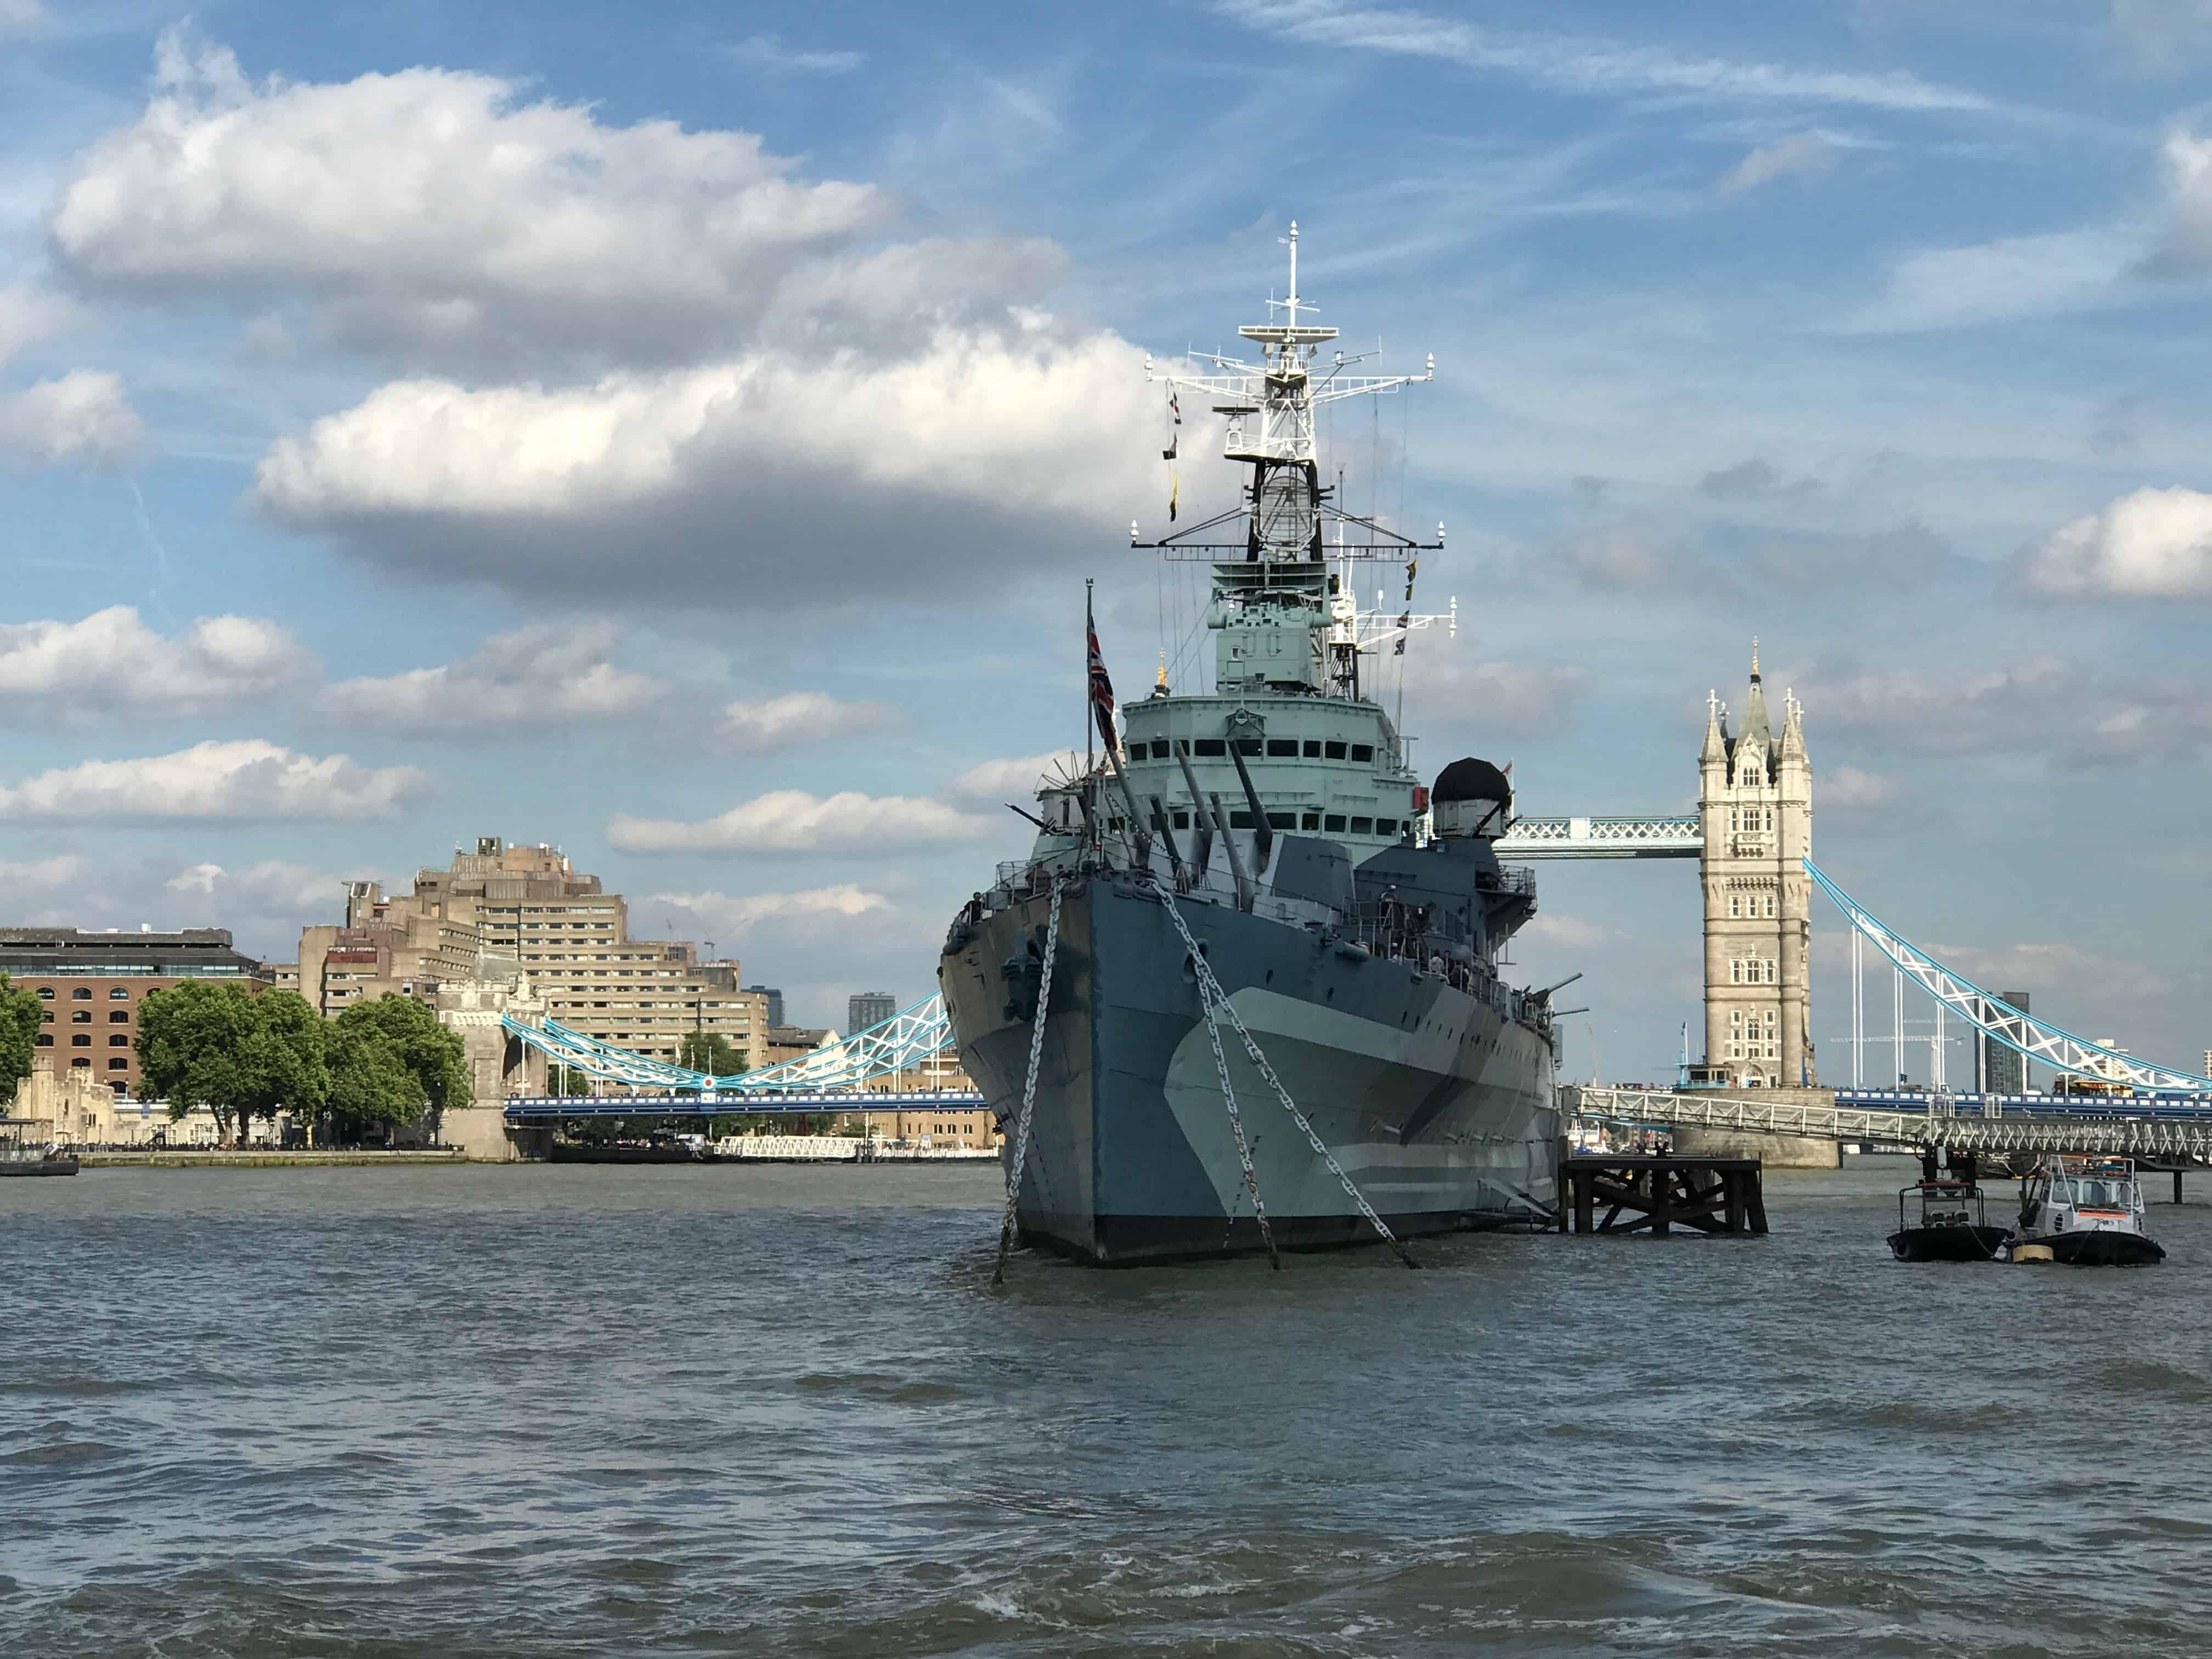 Tower Bridge - HMS Belfast